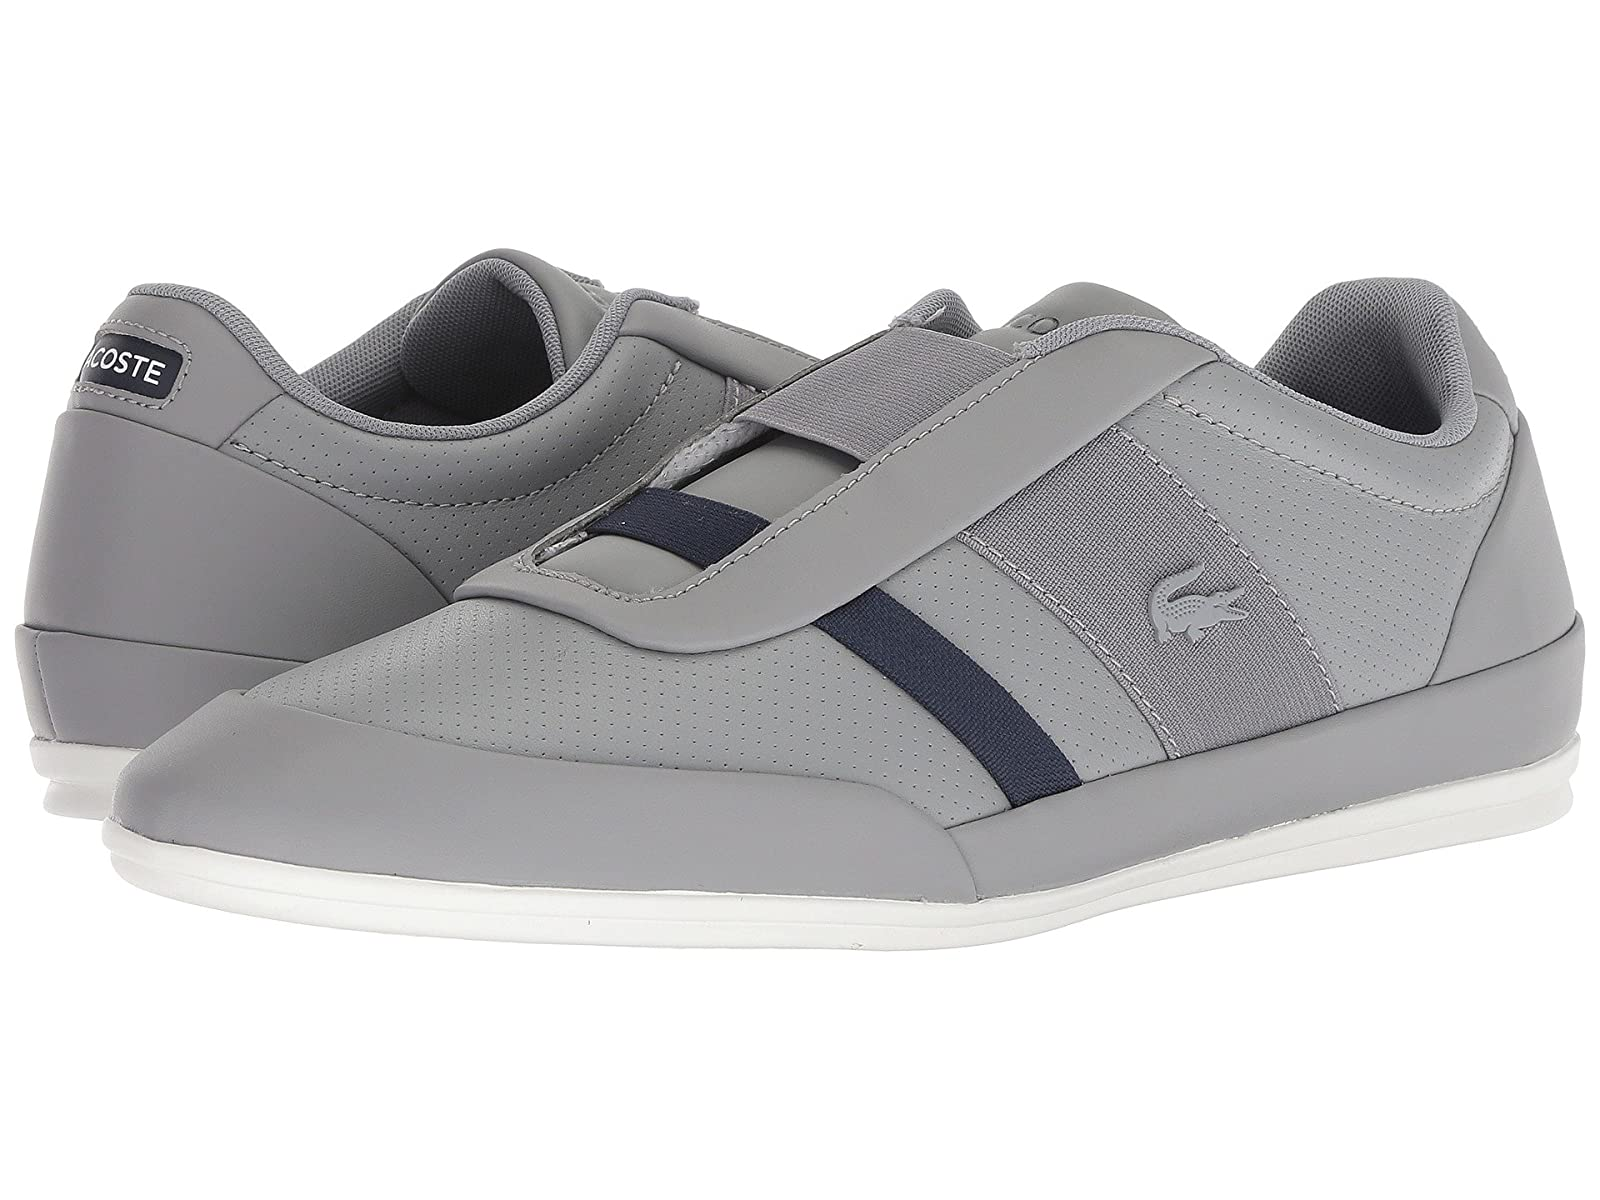 Lacoste Misano Elastic 318 1 UAtmospheric grades have affordable shoes